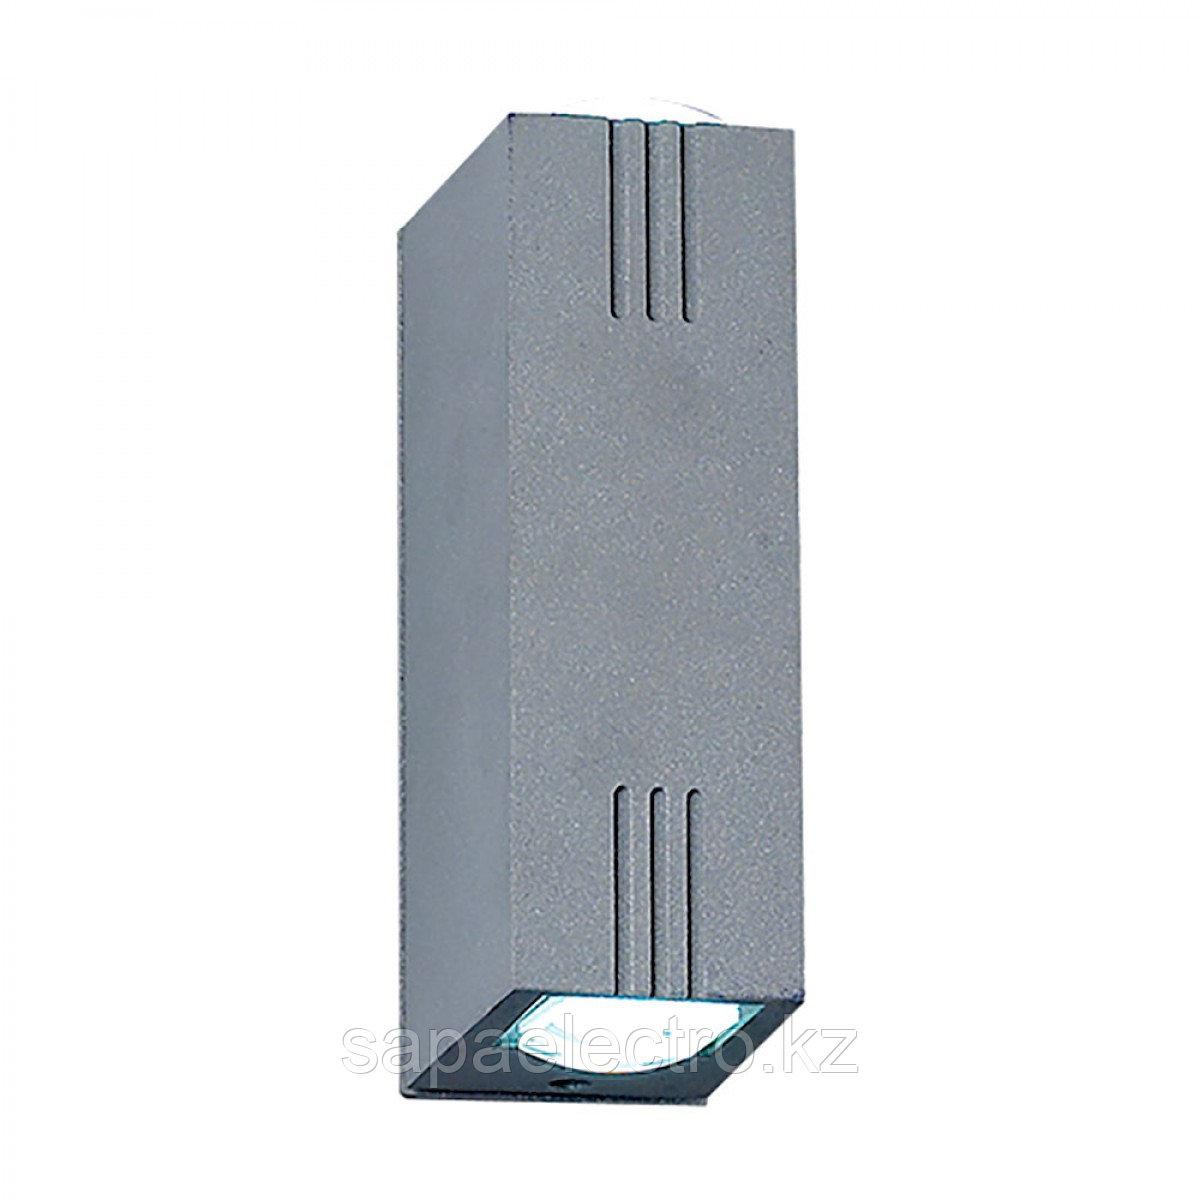 Свет-к  X3000B-2W   BLUE   2X1W LED  IP54(TS) 20шт